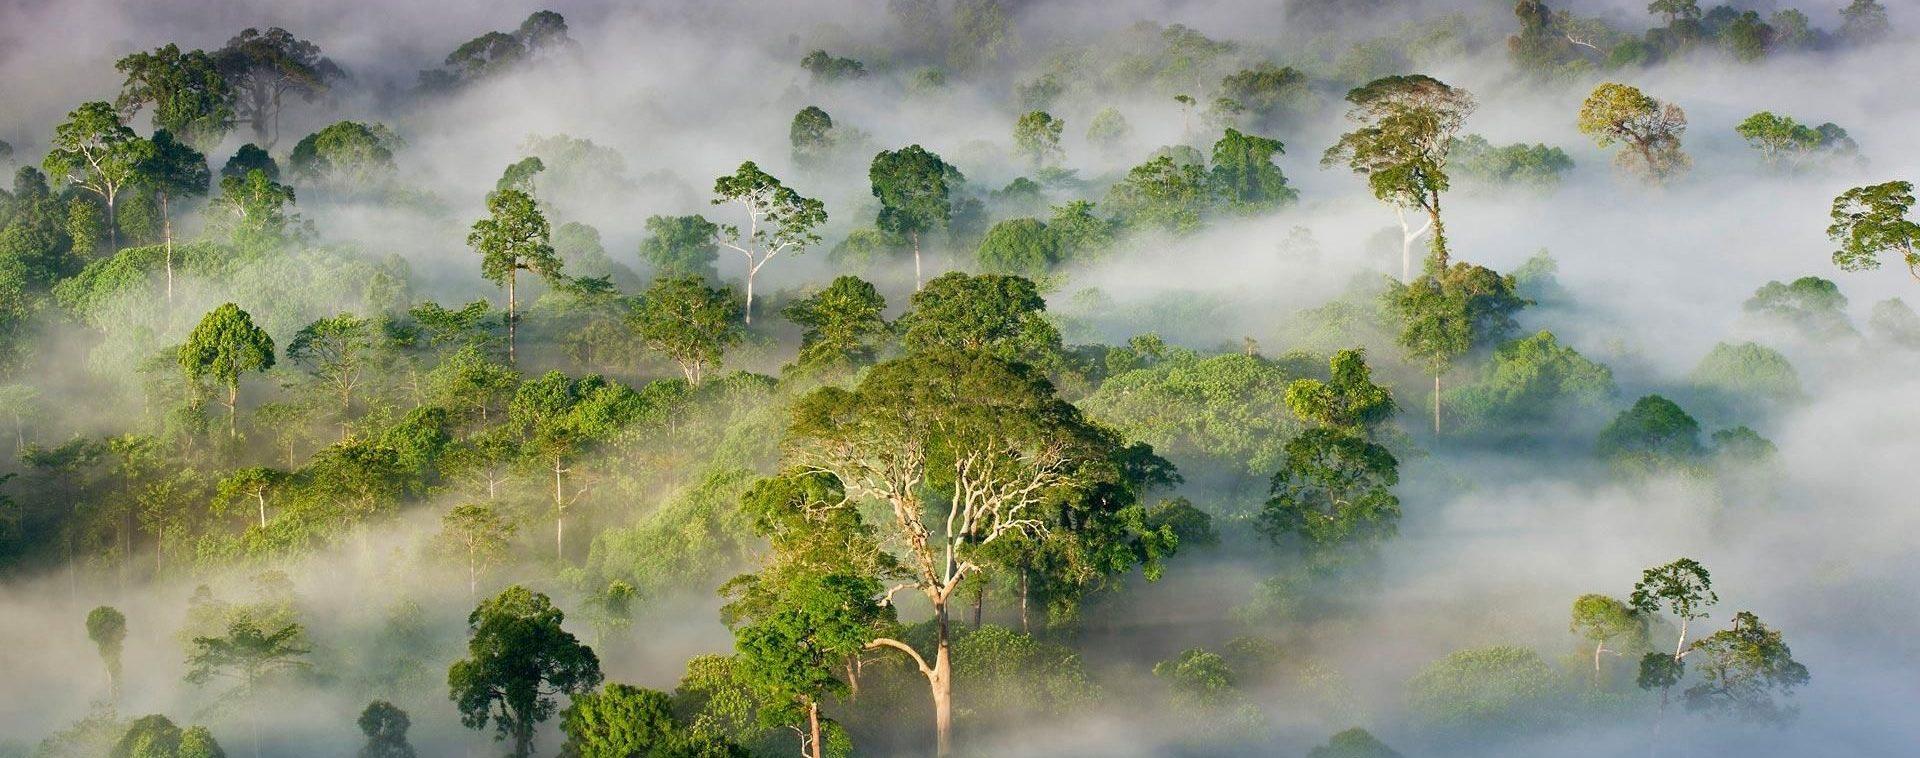 PhotoFly Travel Club | danum-valley-fog | PhotoFly Travel Club